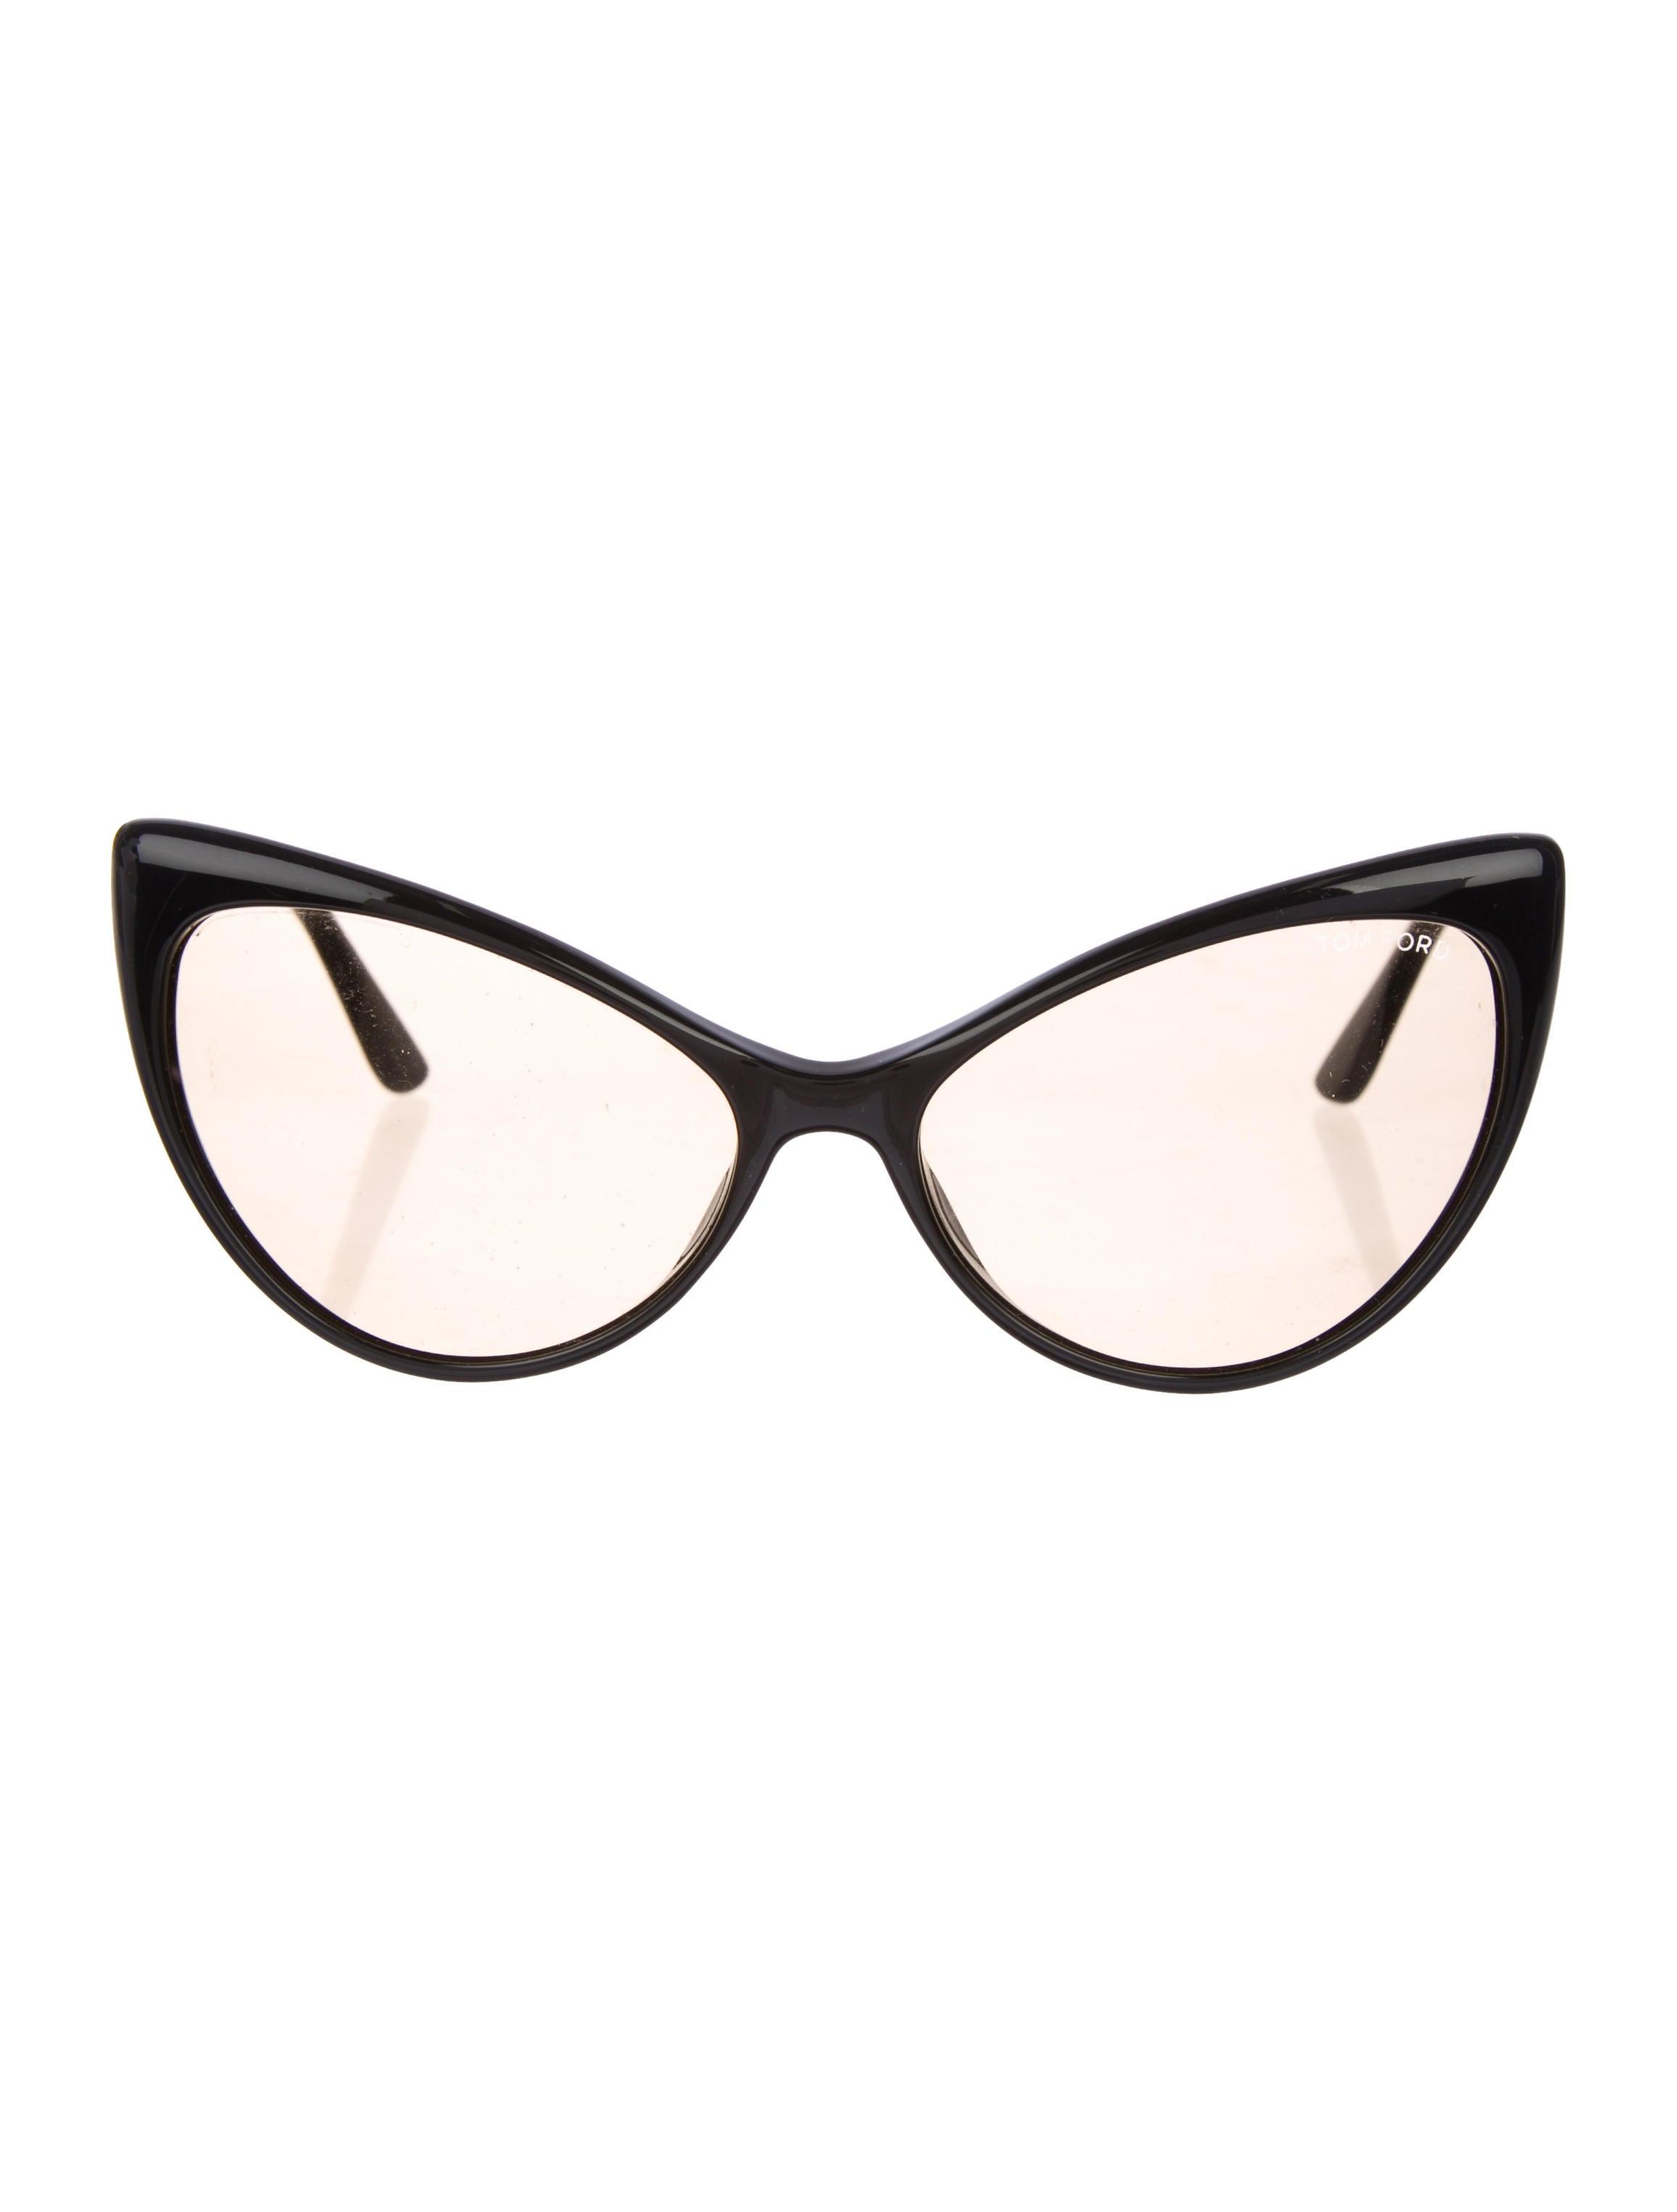 6810c4a697 Tom Ford Anastasia Cat-Eye Sunglasses - Accessories - TOM40632